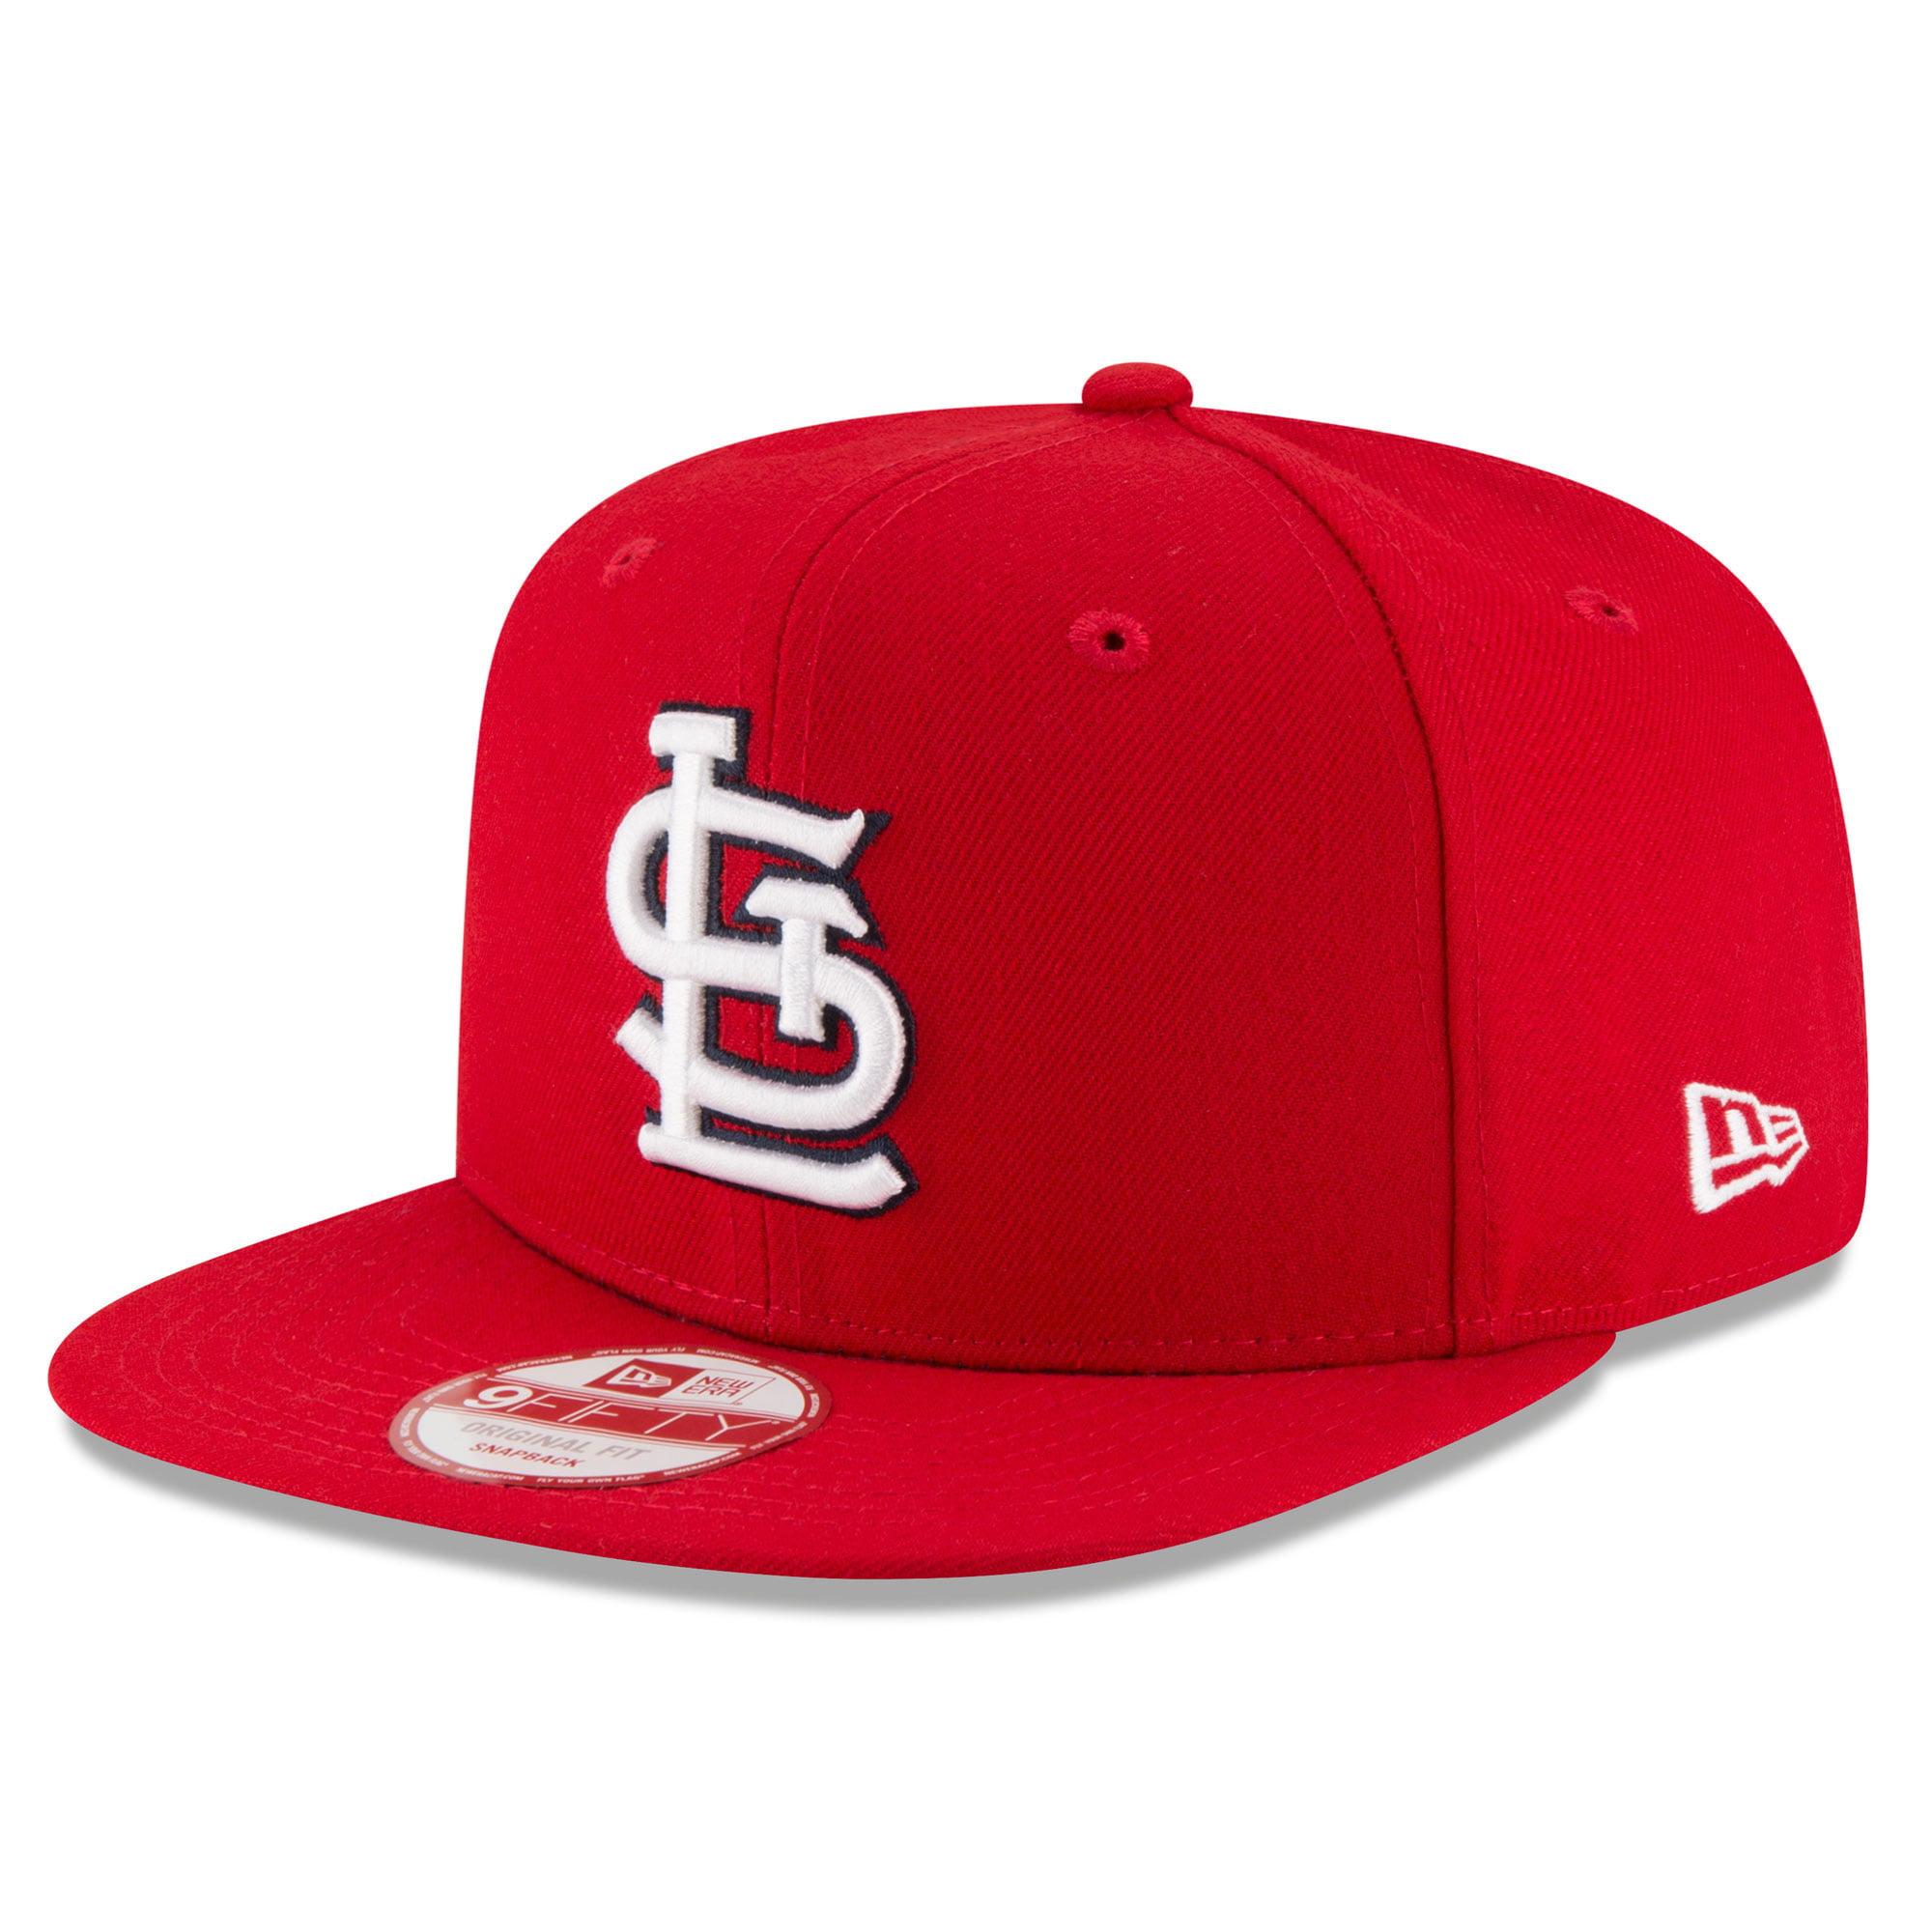 size 40 d4e57 b4562 St. Louis Cardinals New Era Flag Side Original Fit 9FIFTY Snapback  Adjustable Hat - Red - OSFA - Walmart.com